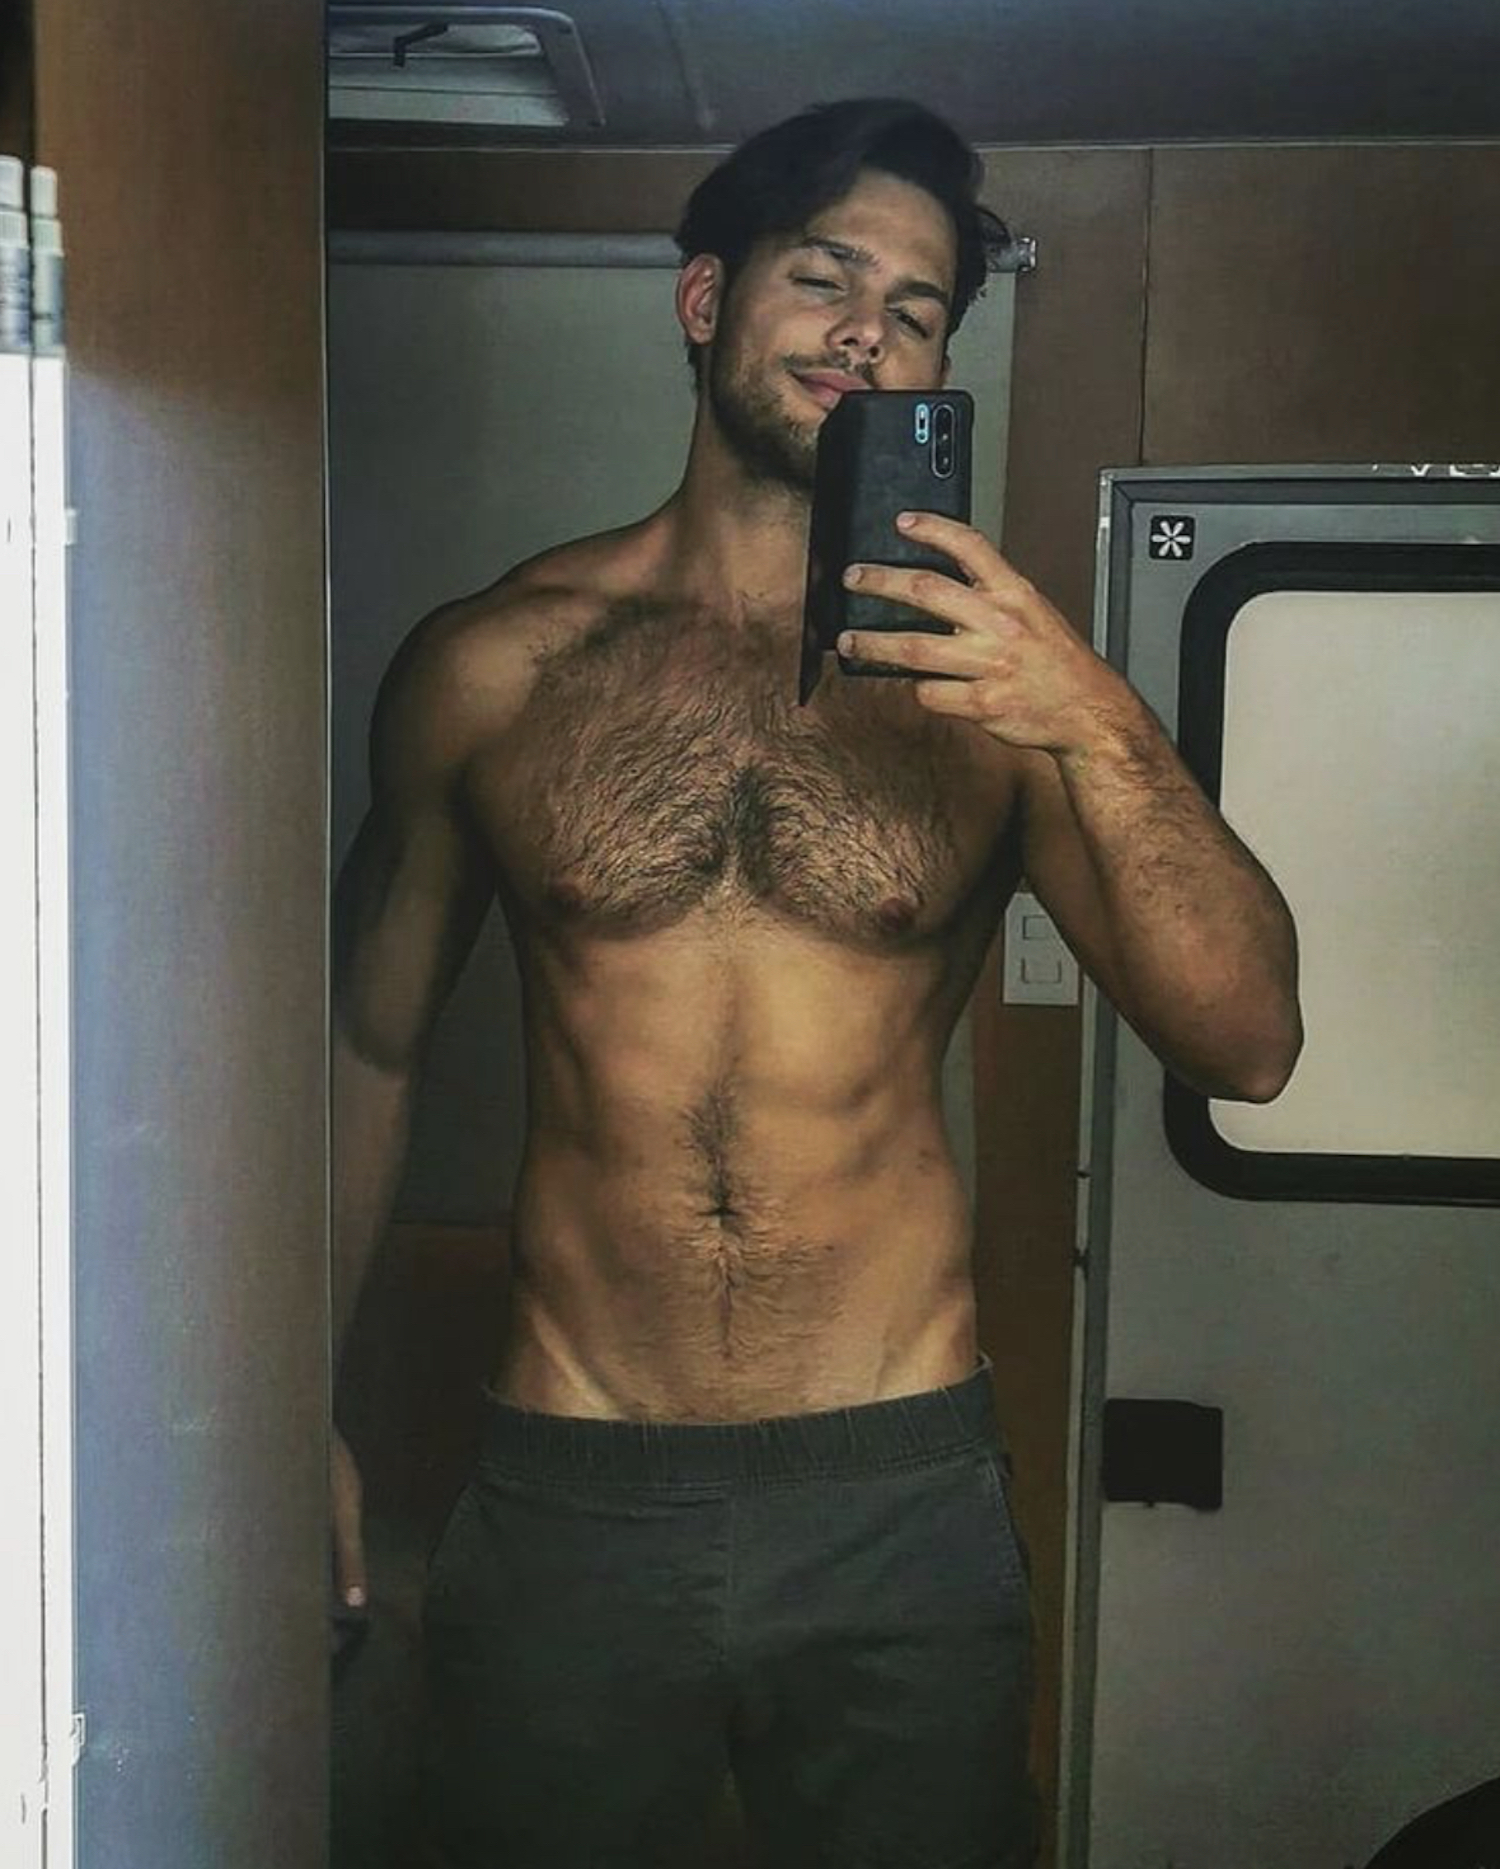 Emmanuel Palomares